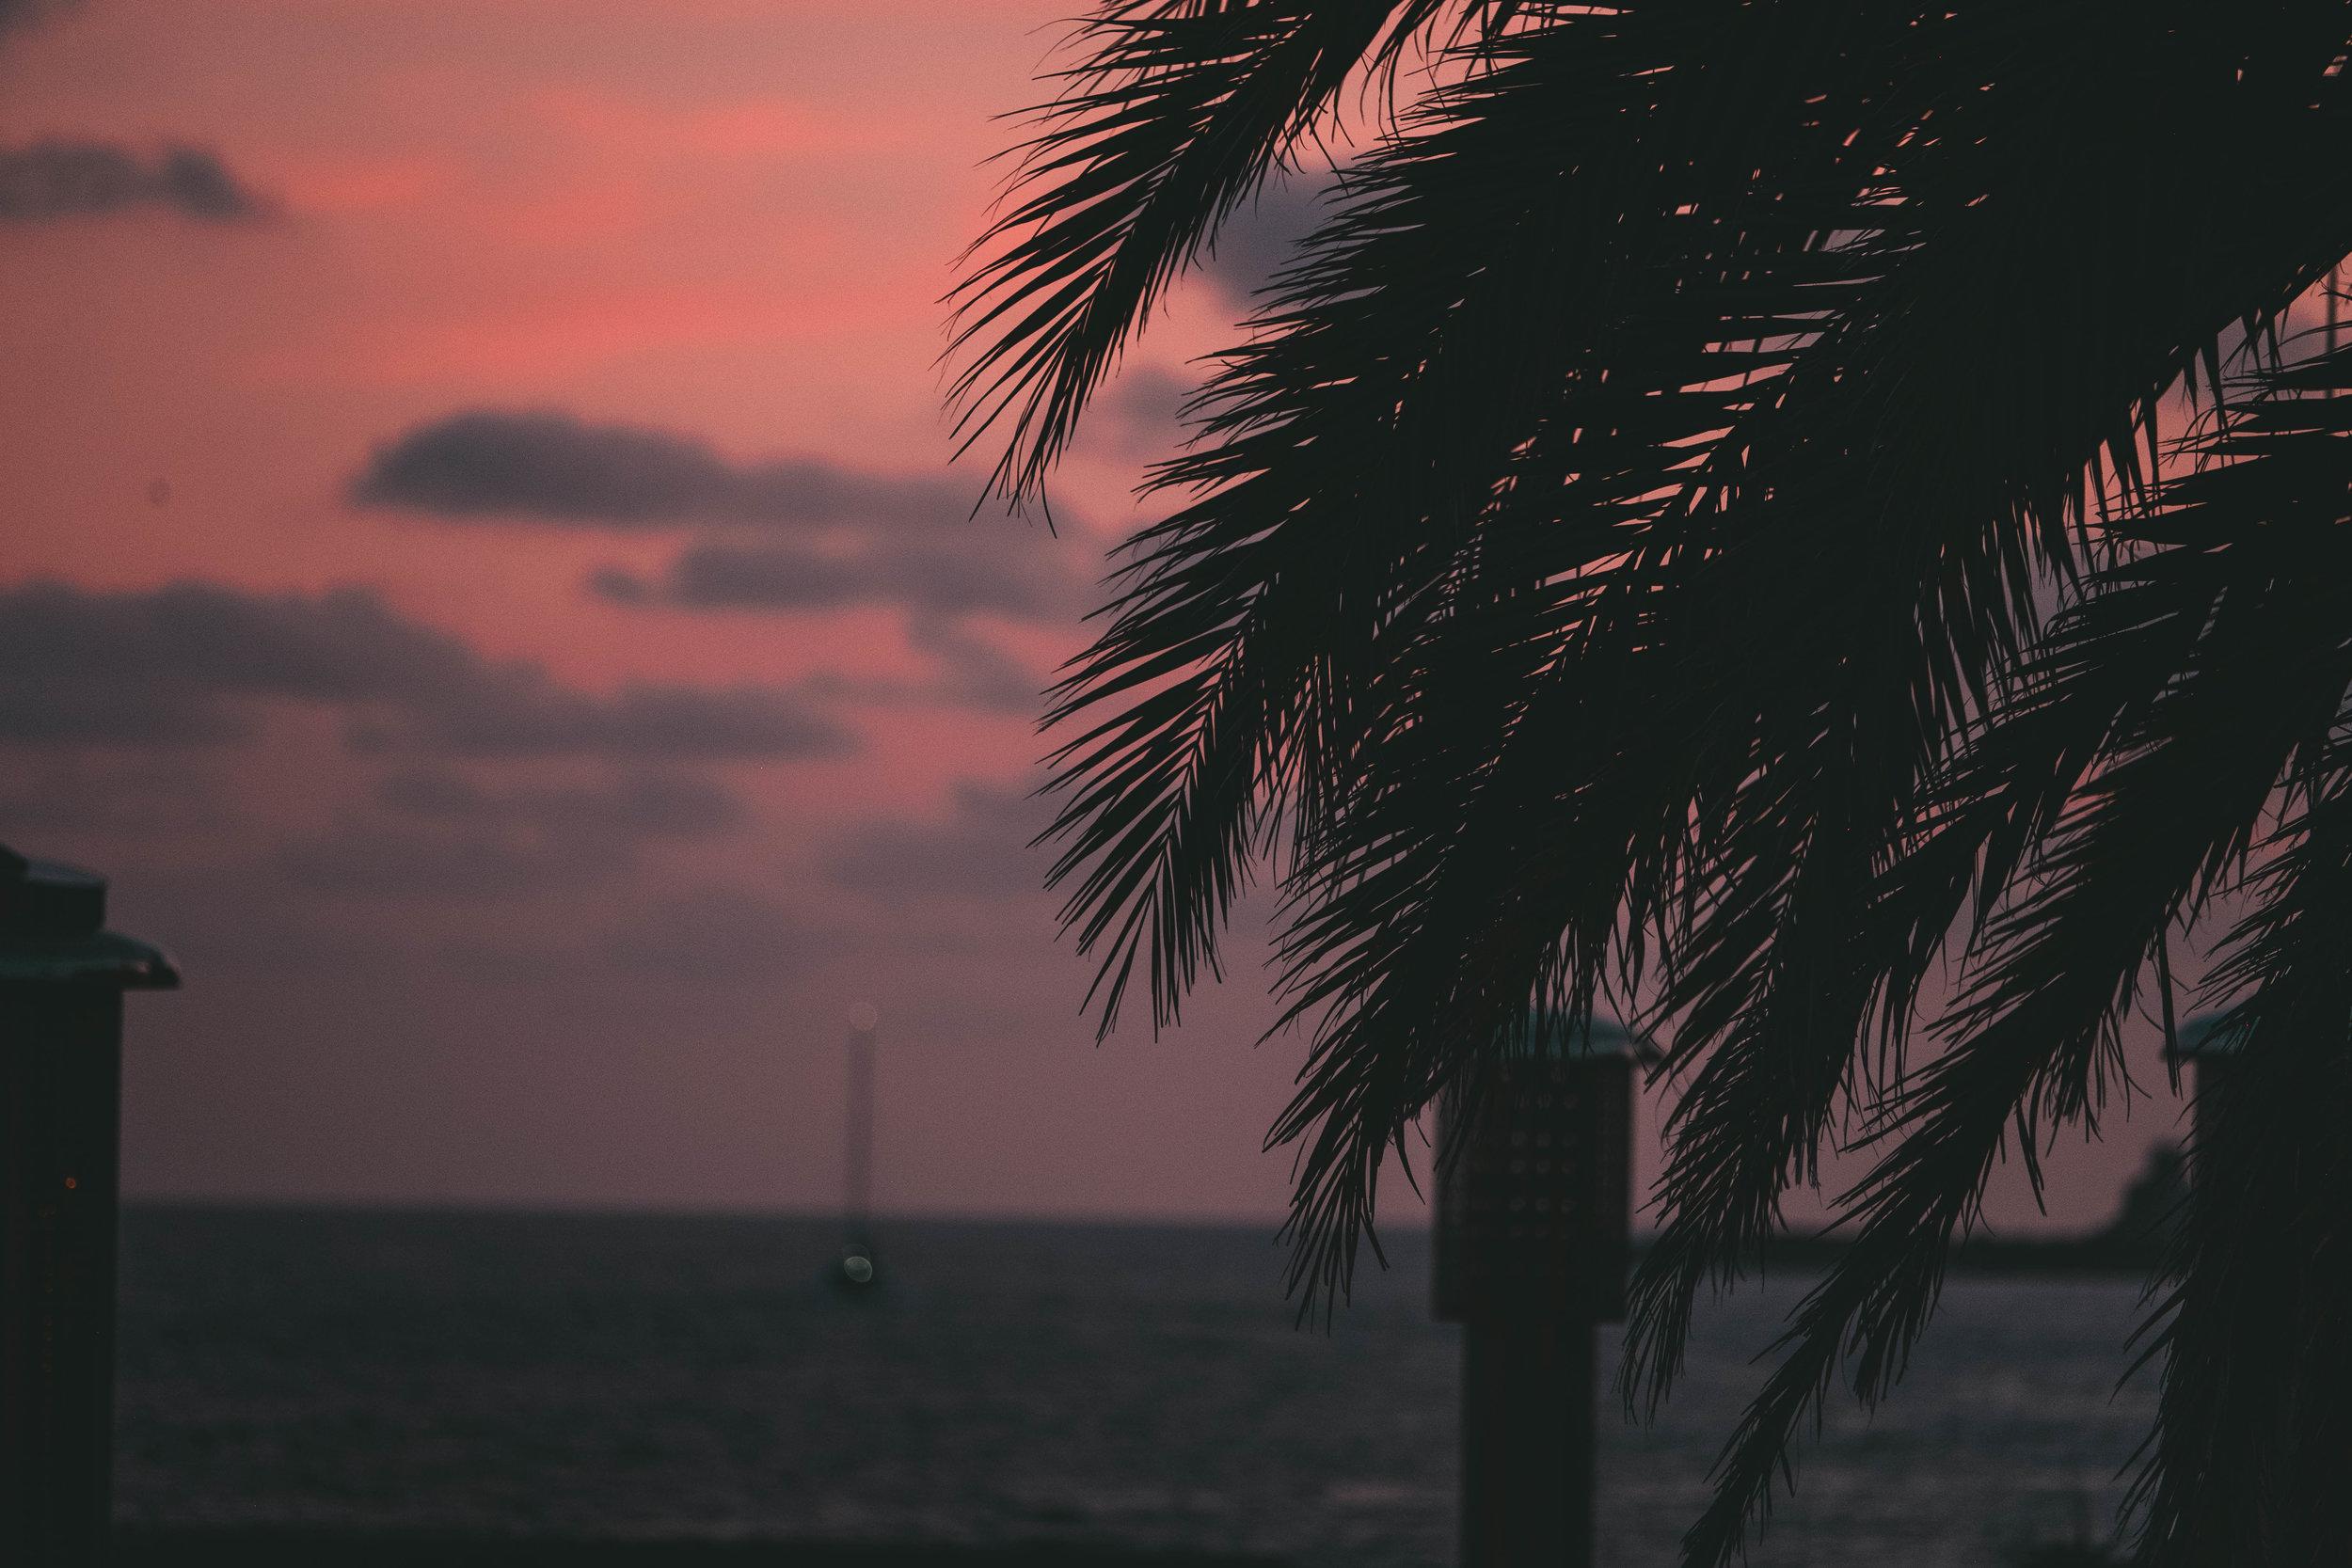 Palms in Palma.